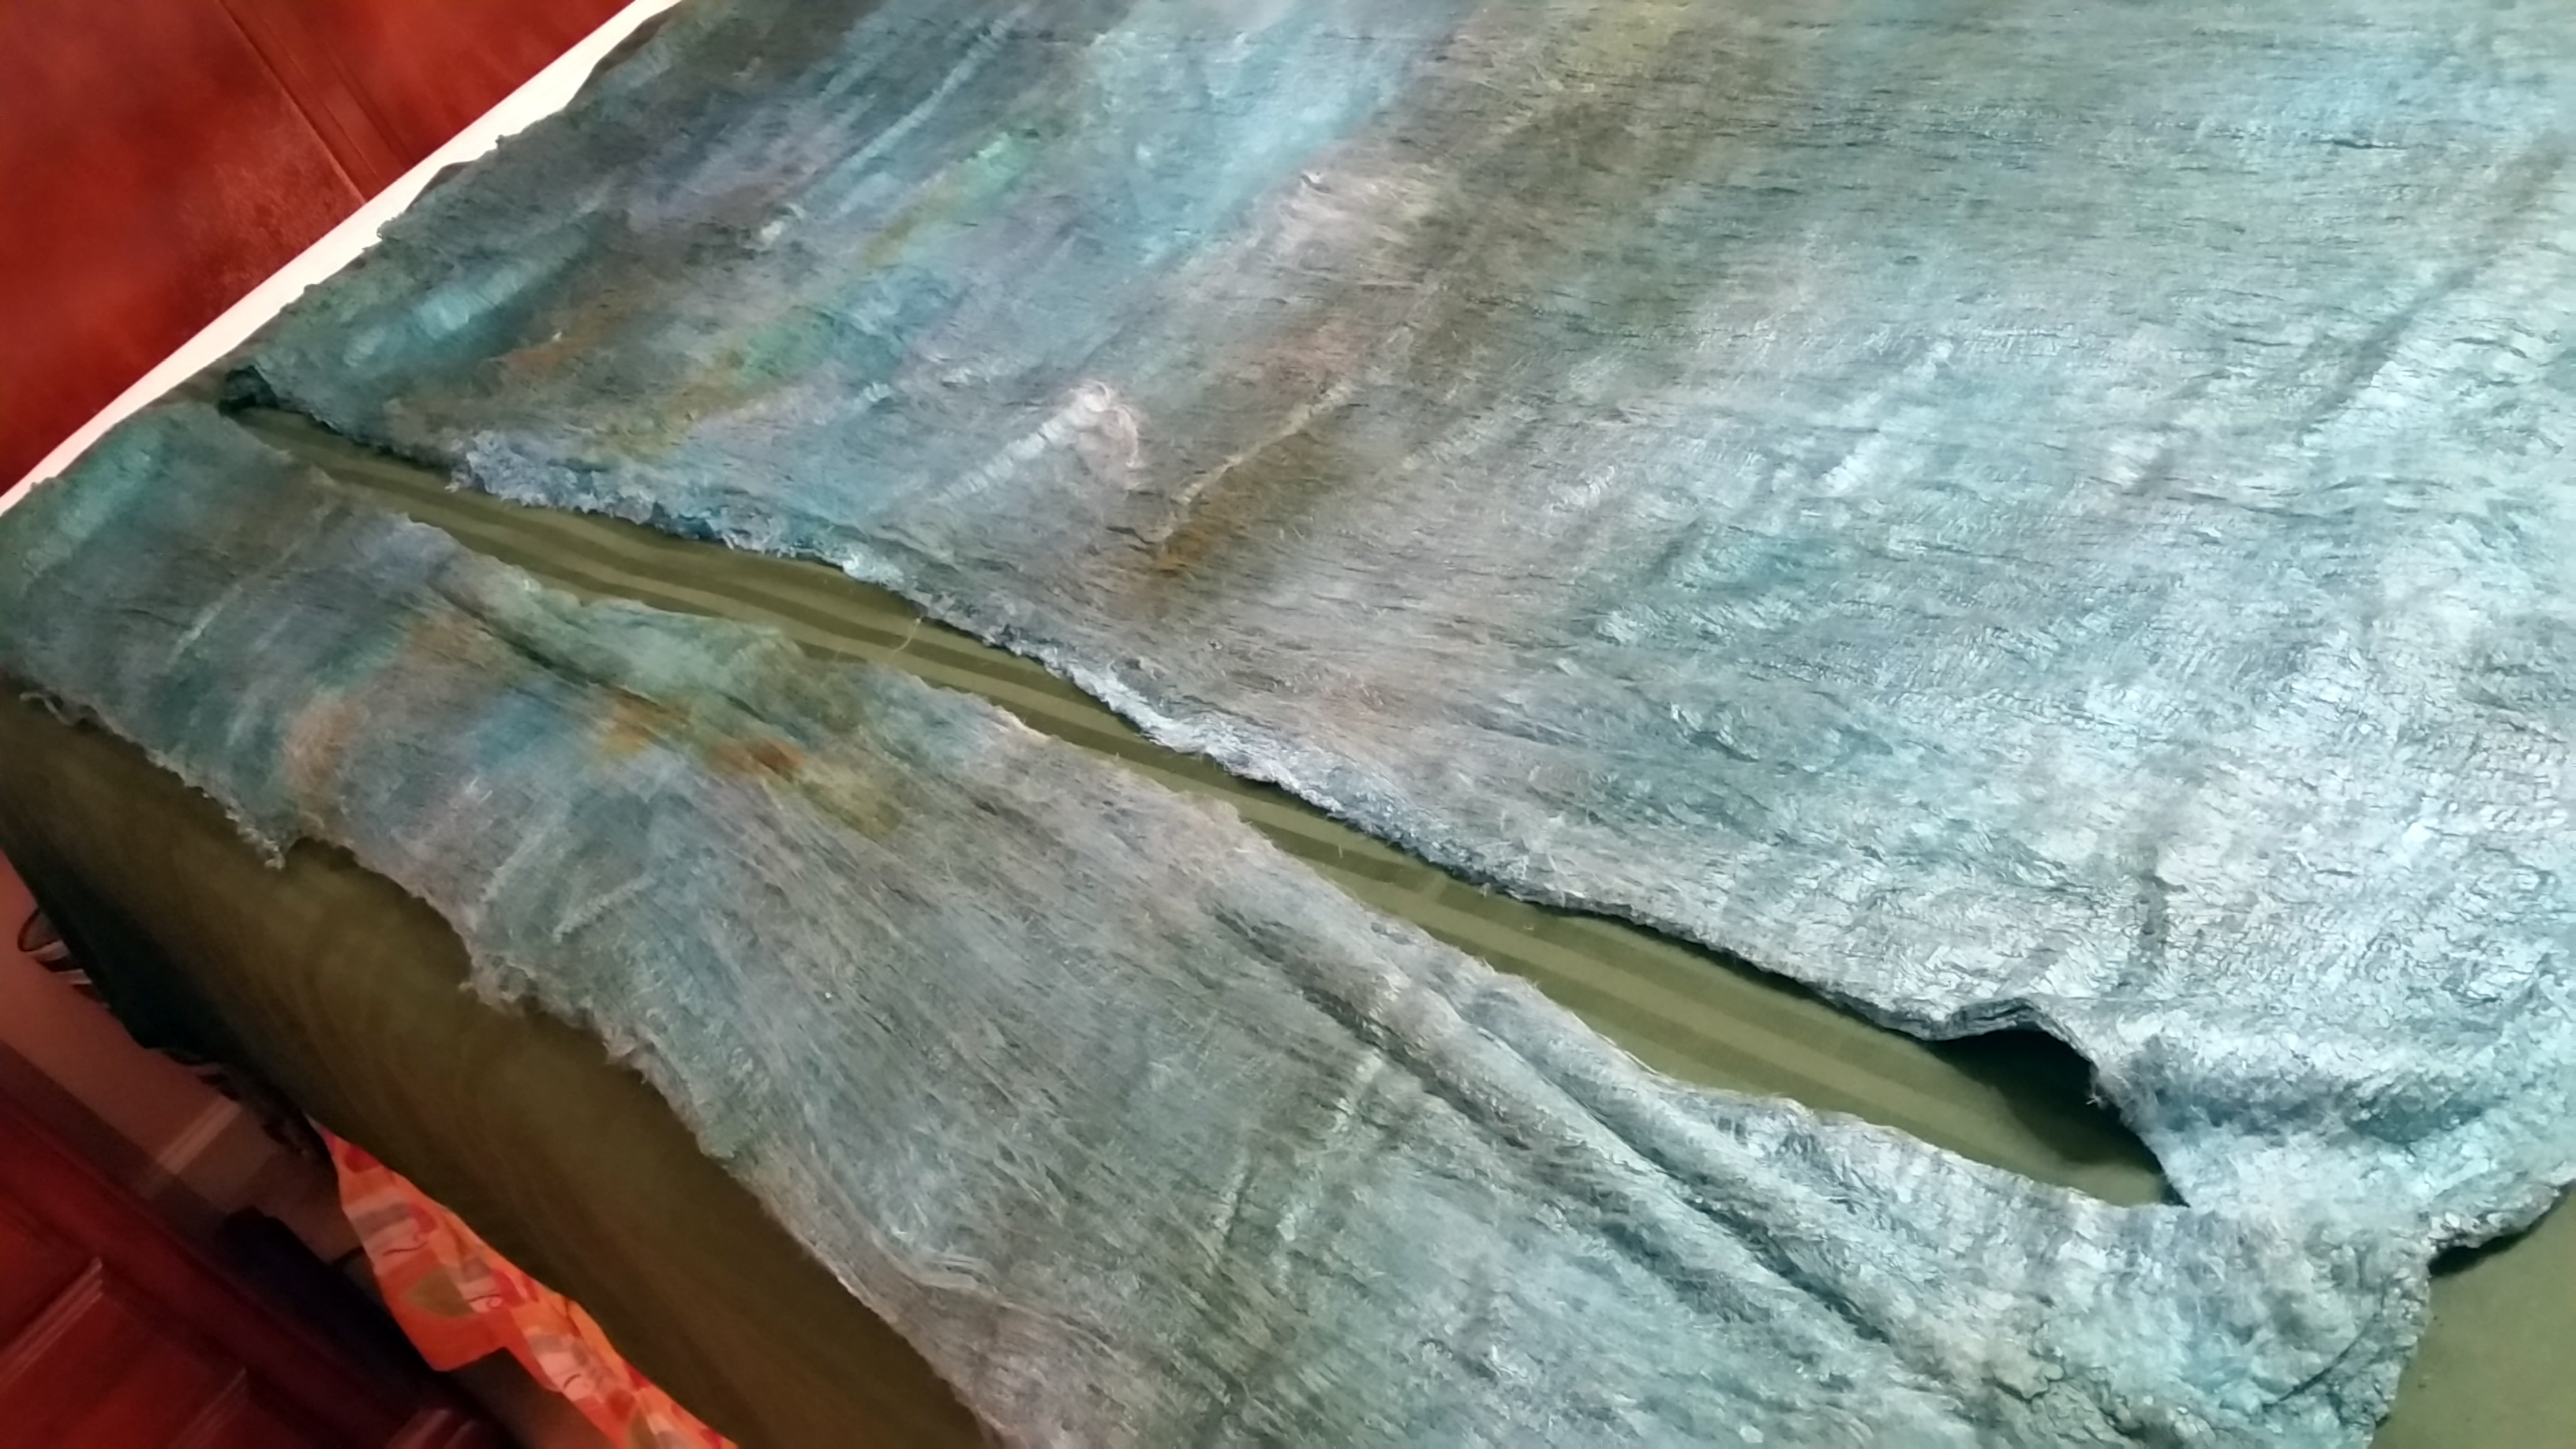 The Silk Lap, a strip cut off